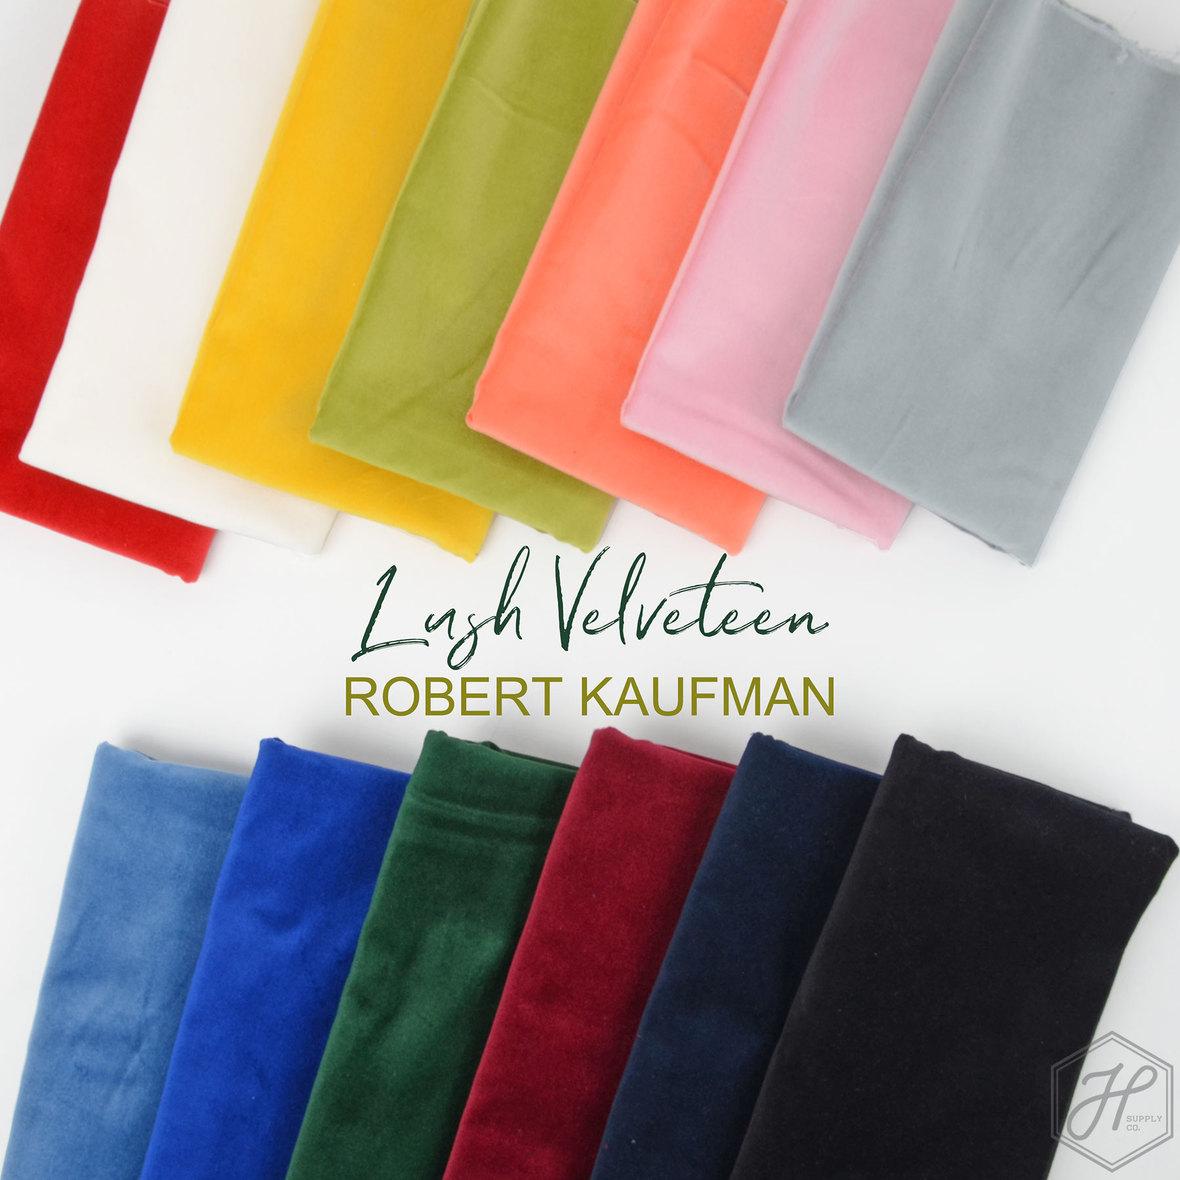 Lush-Velveteen-Fabric-Robert-Kaufman-at-Hawthorne